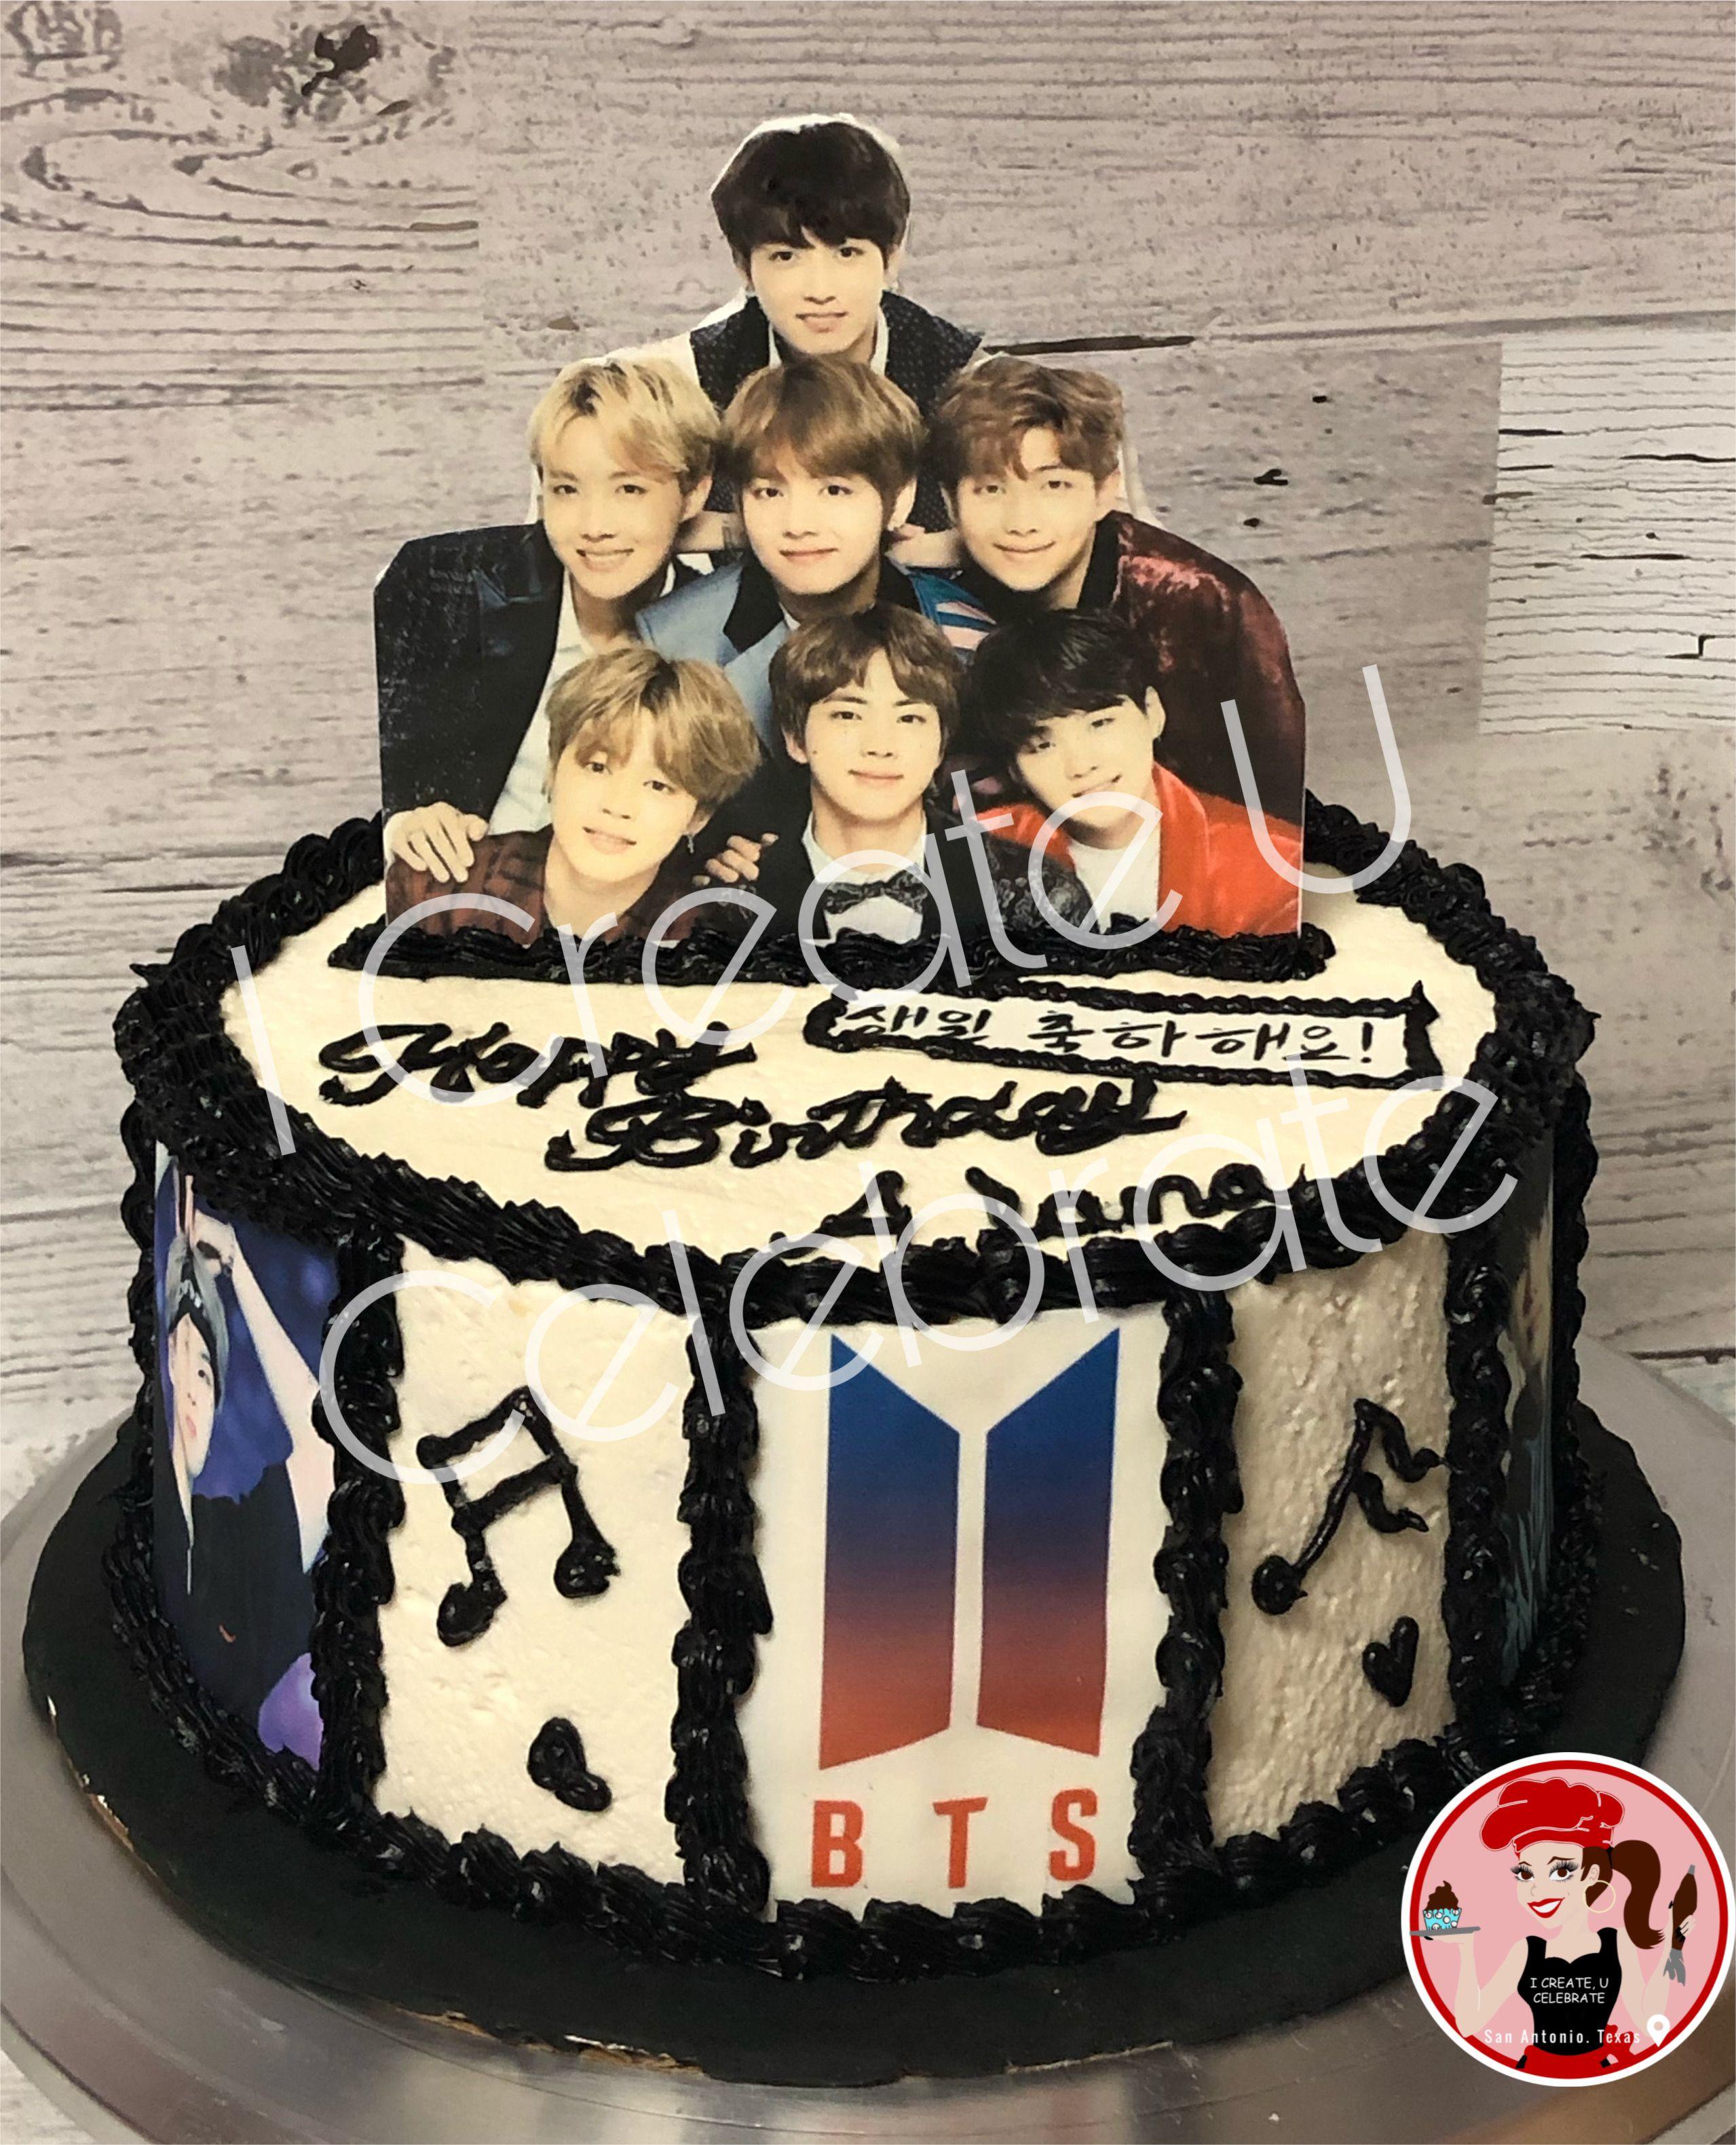 Bts Cake Bts Cake Gorgeous Cakes Cake